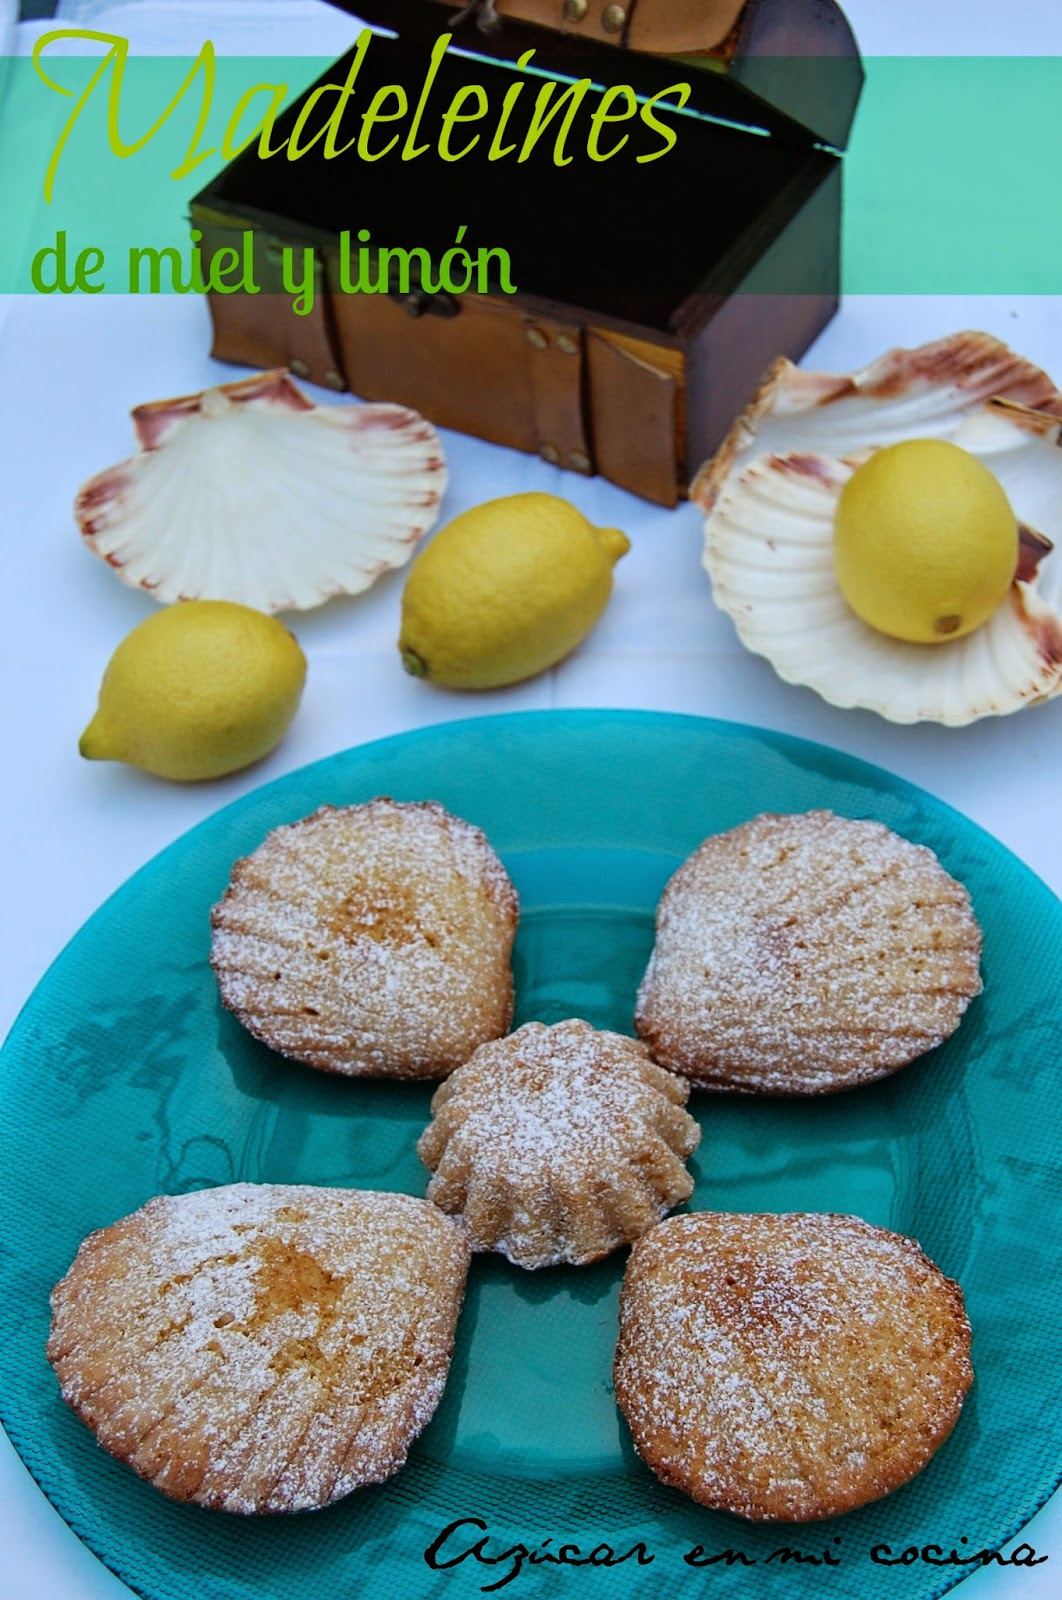 http://azucarenmicocina.blogspot.com.es/2014/10/madeleines-de-miel-y-limon.html